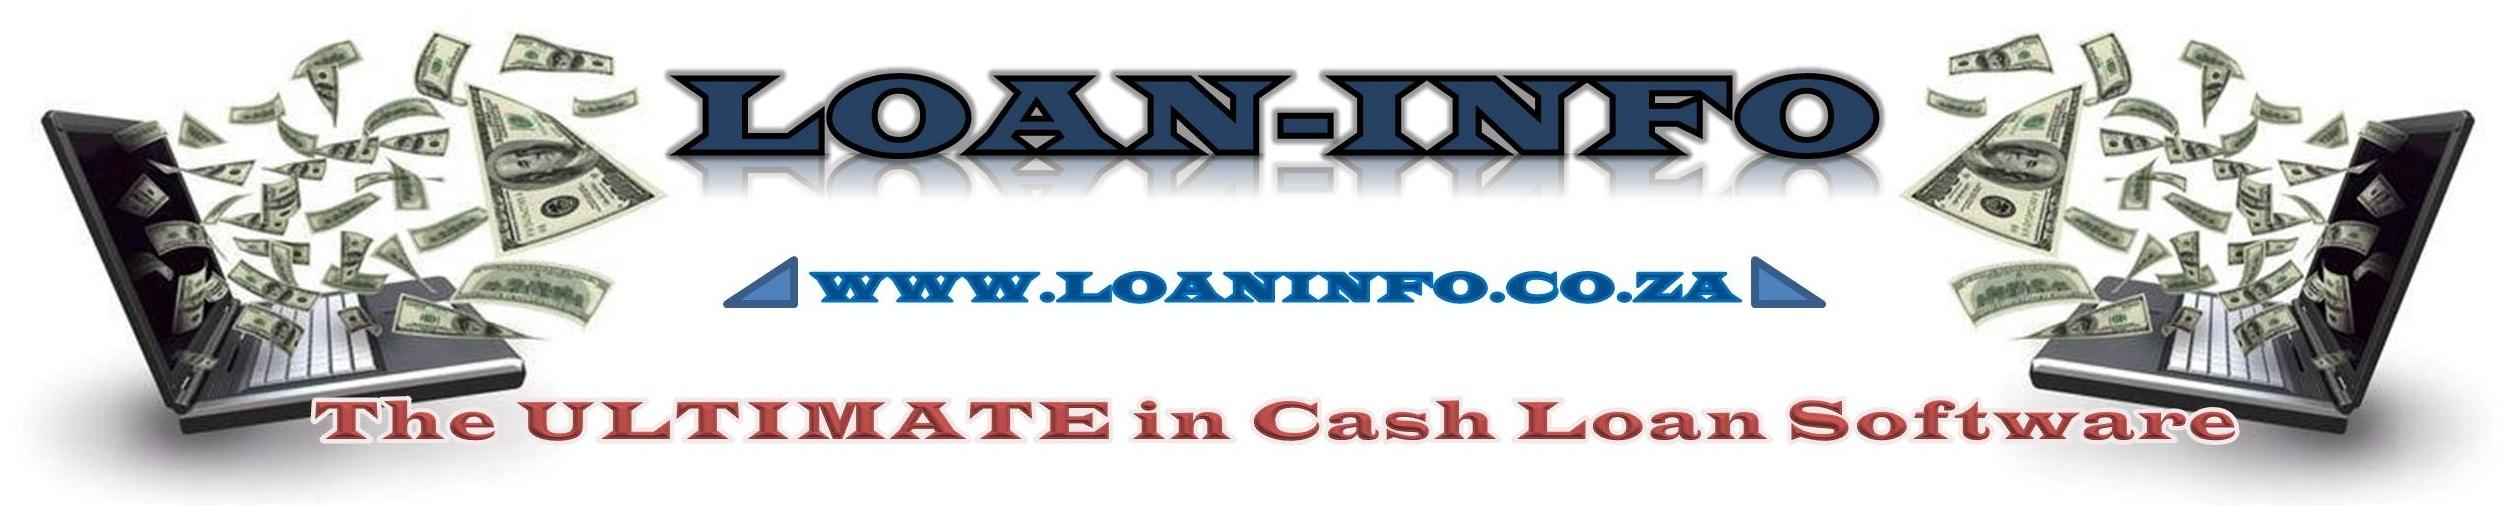 Payday loans in bradley il photo 8